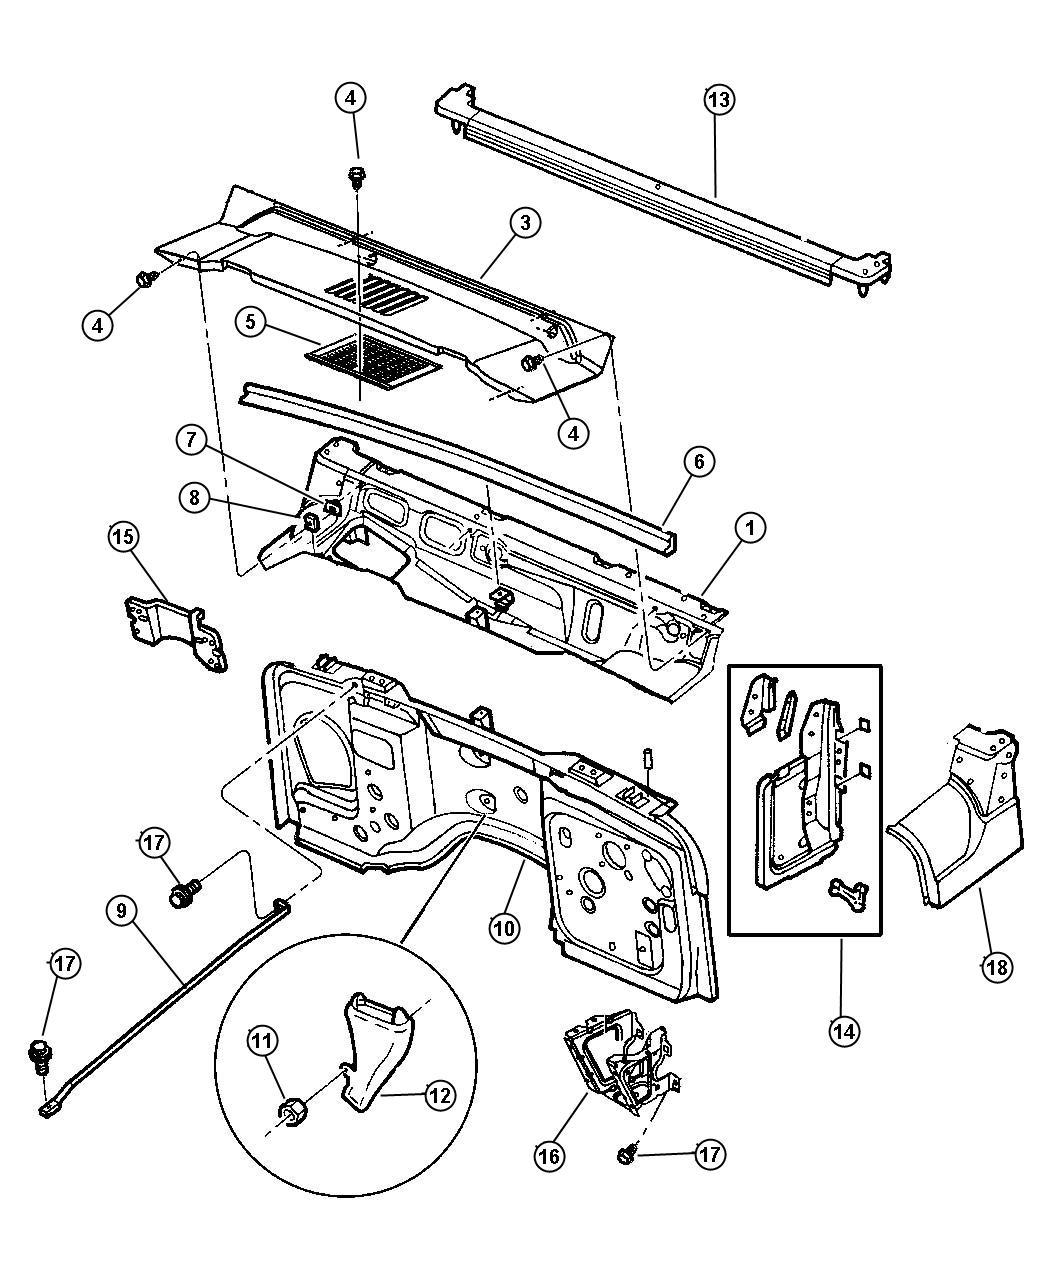 Jeep Wrangler Seal Plenum Drain Panels Fca Dash Cowl